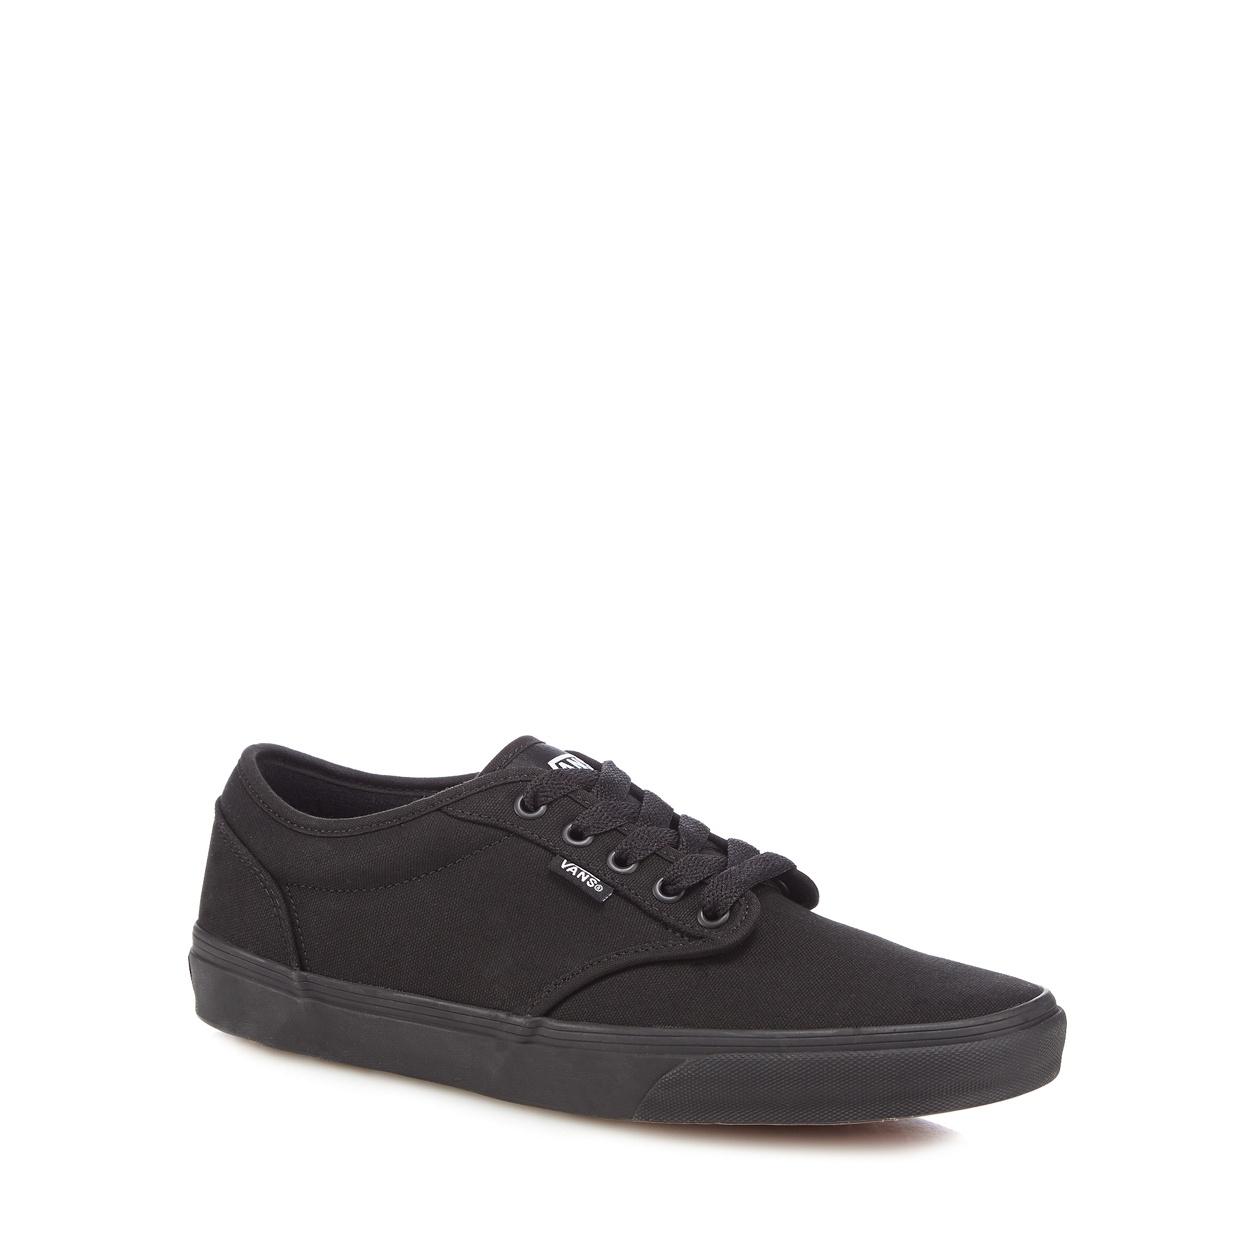 Black sandals debenhams - About This Item